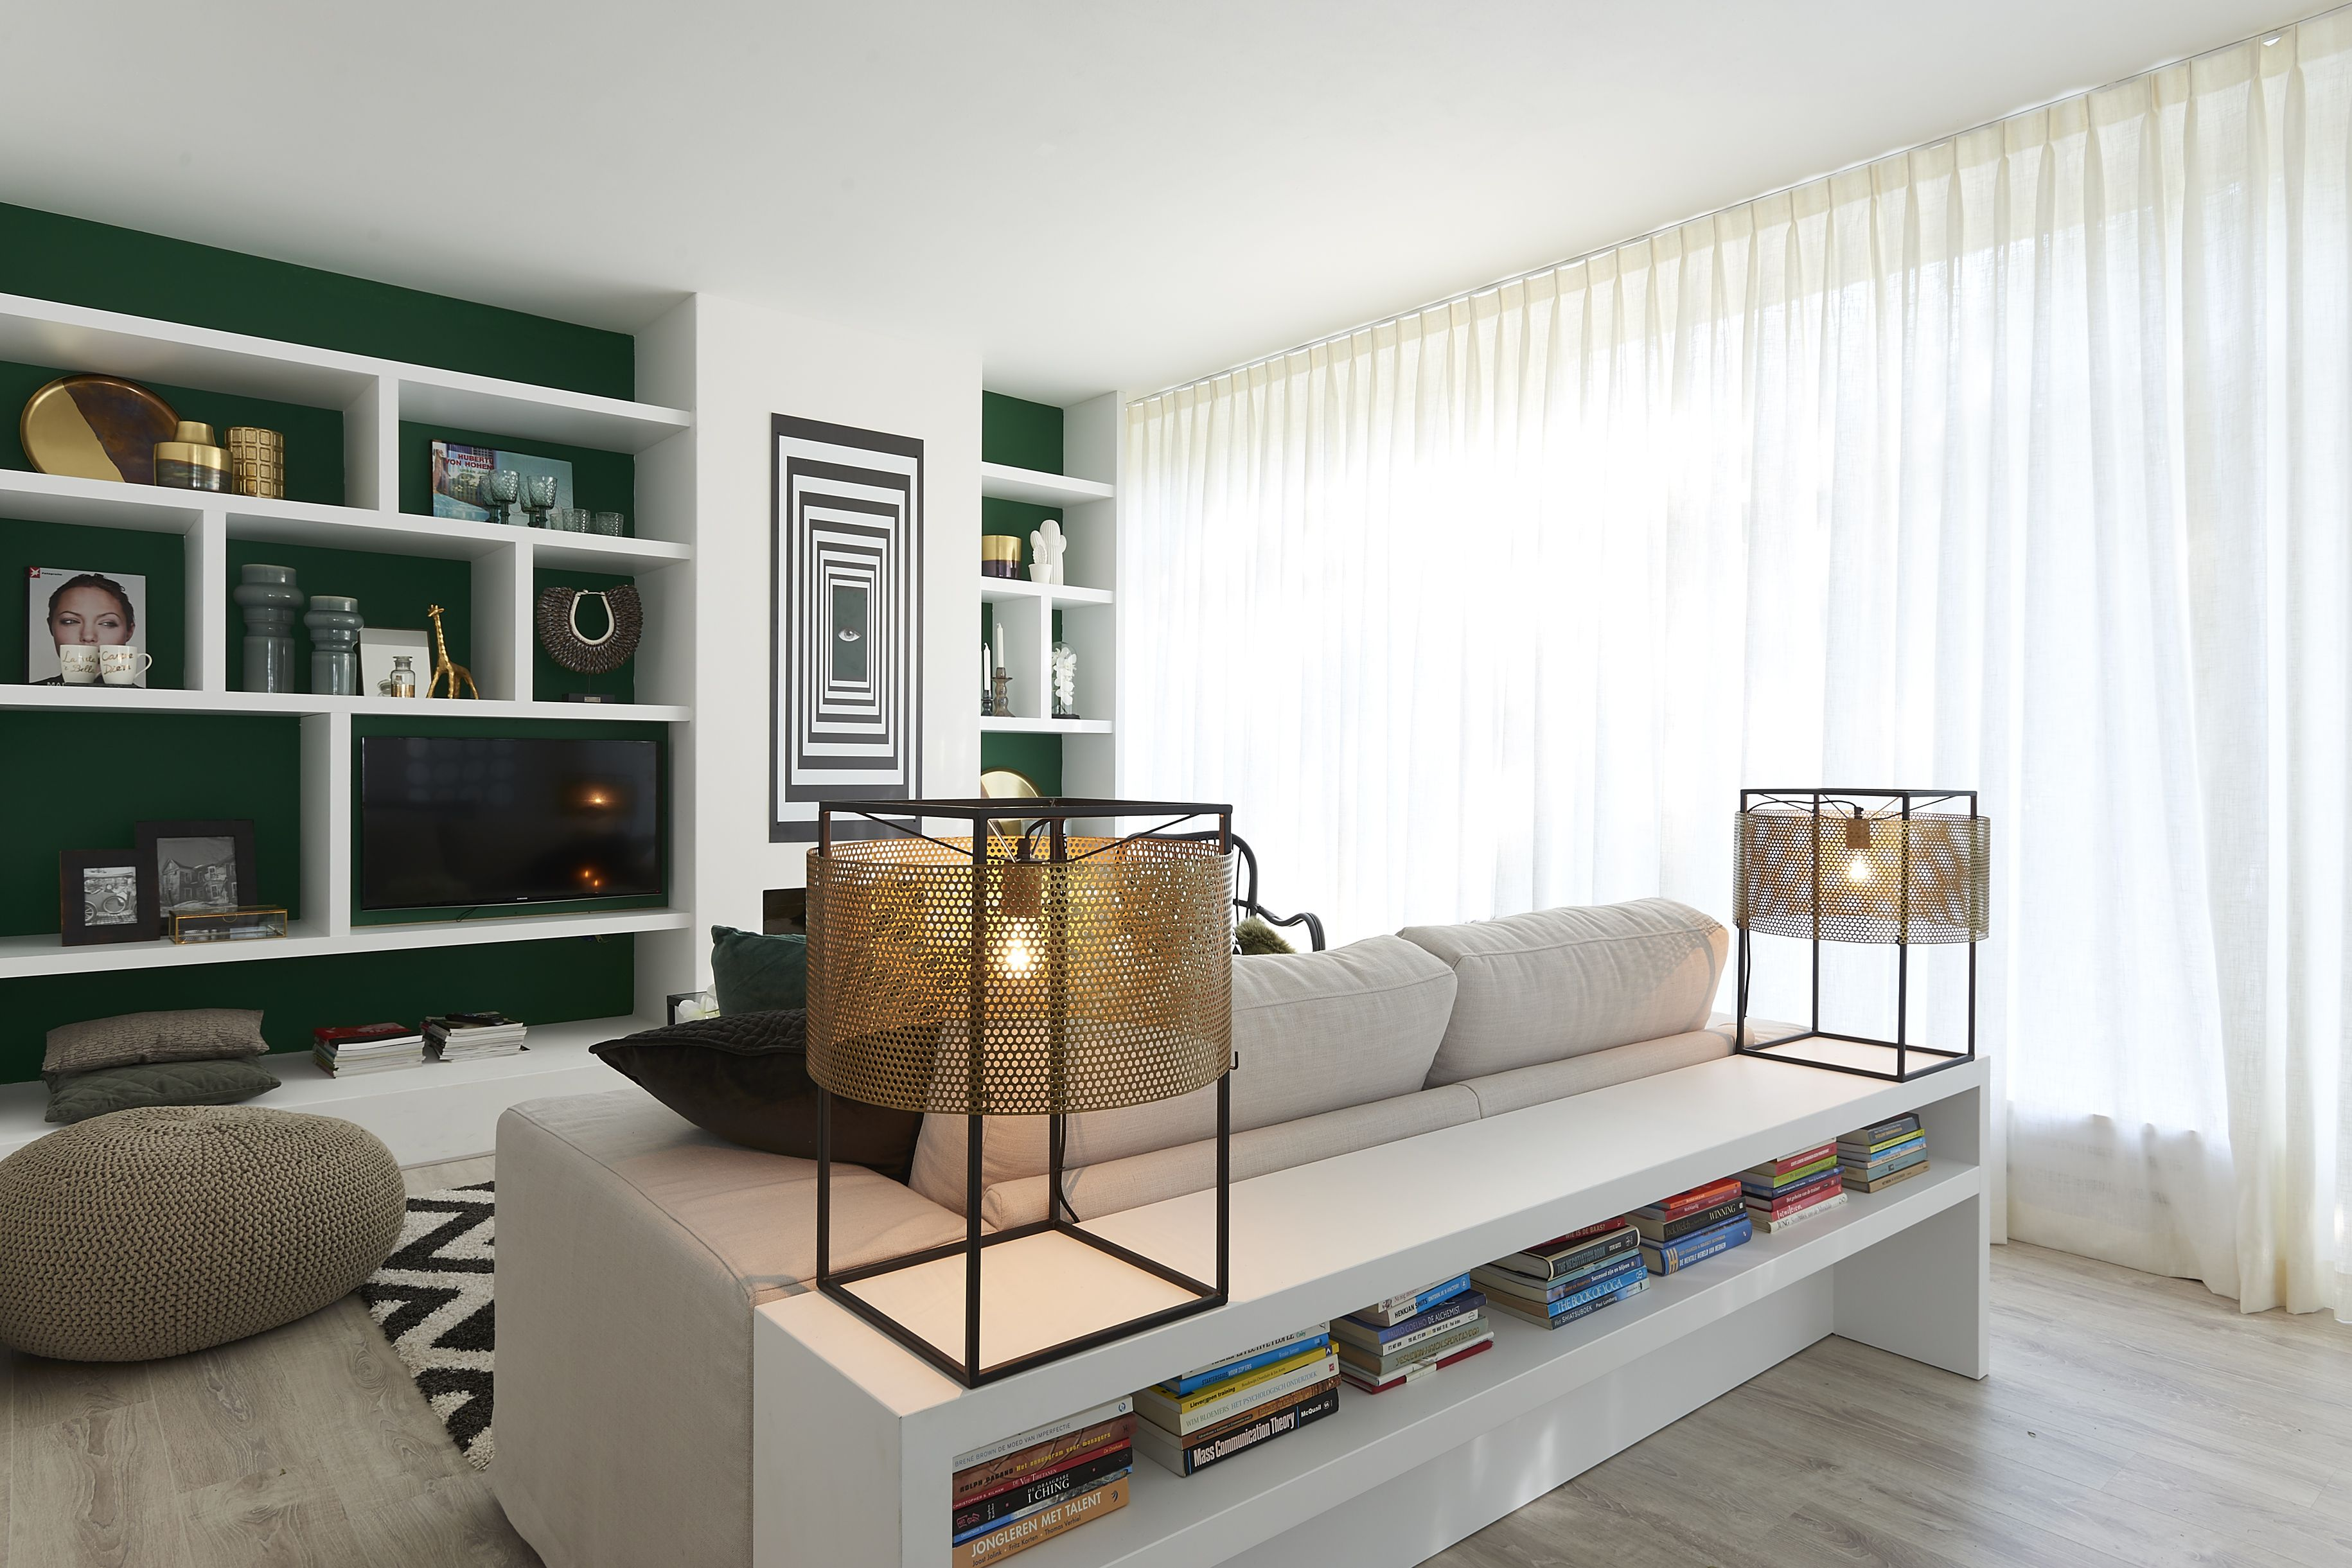 rust ruimte en licht linnen gordijnen vintage 01 rtl On woonmagazine